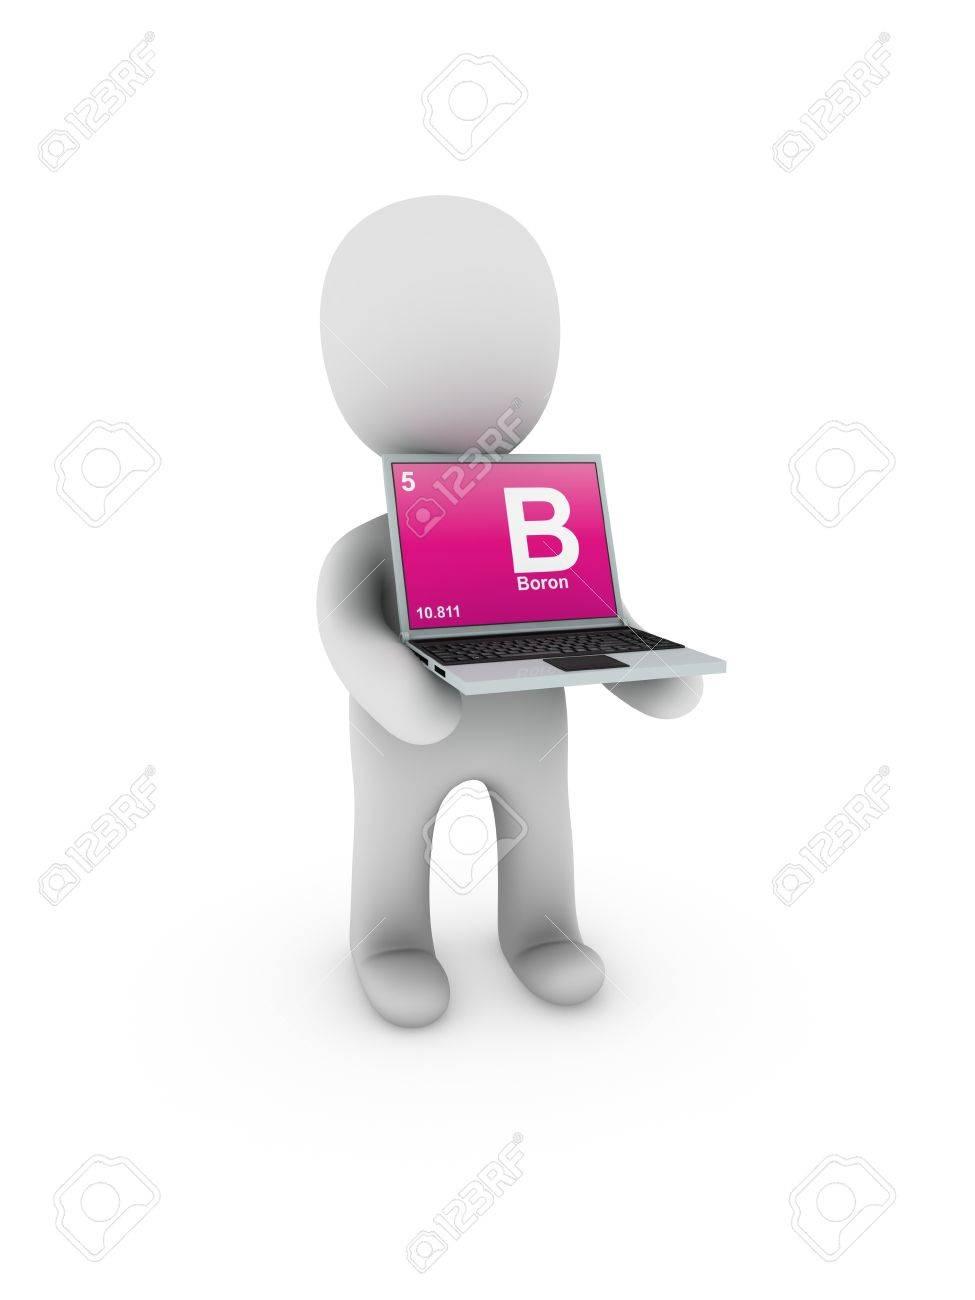 boron symbol on screen laptop Stock Photo - 13538426